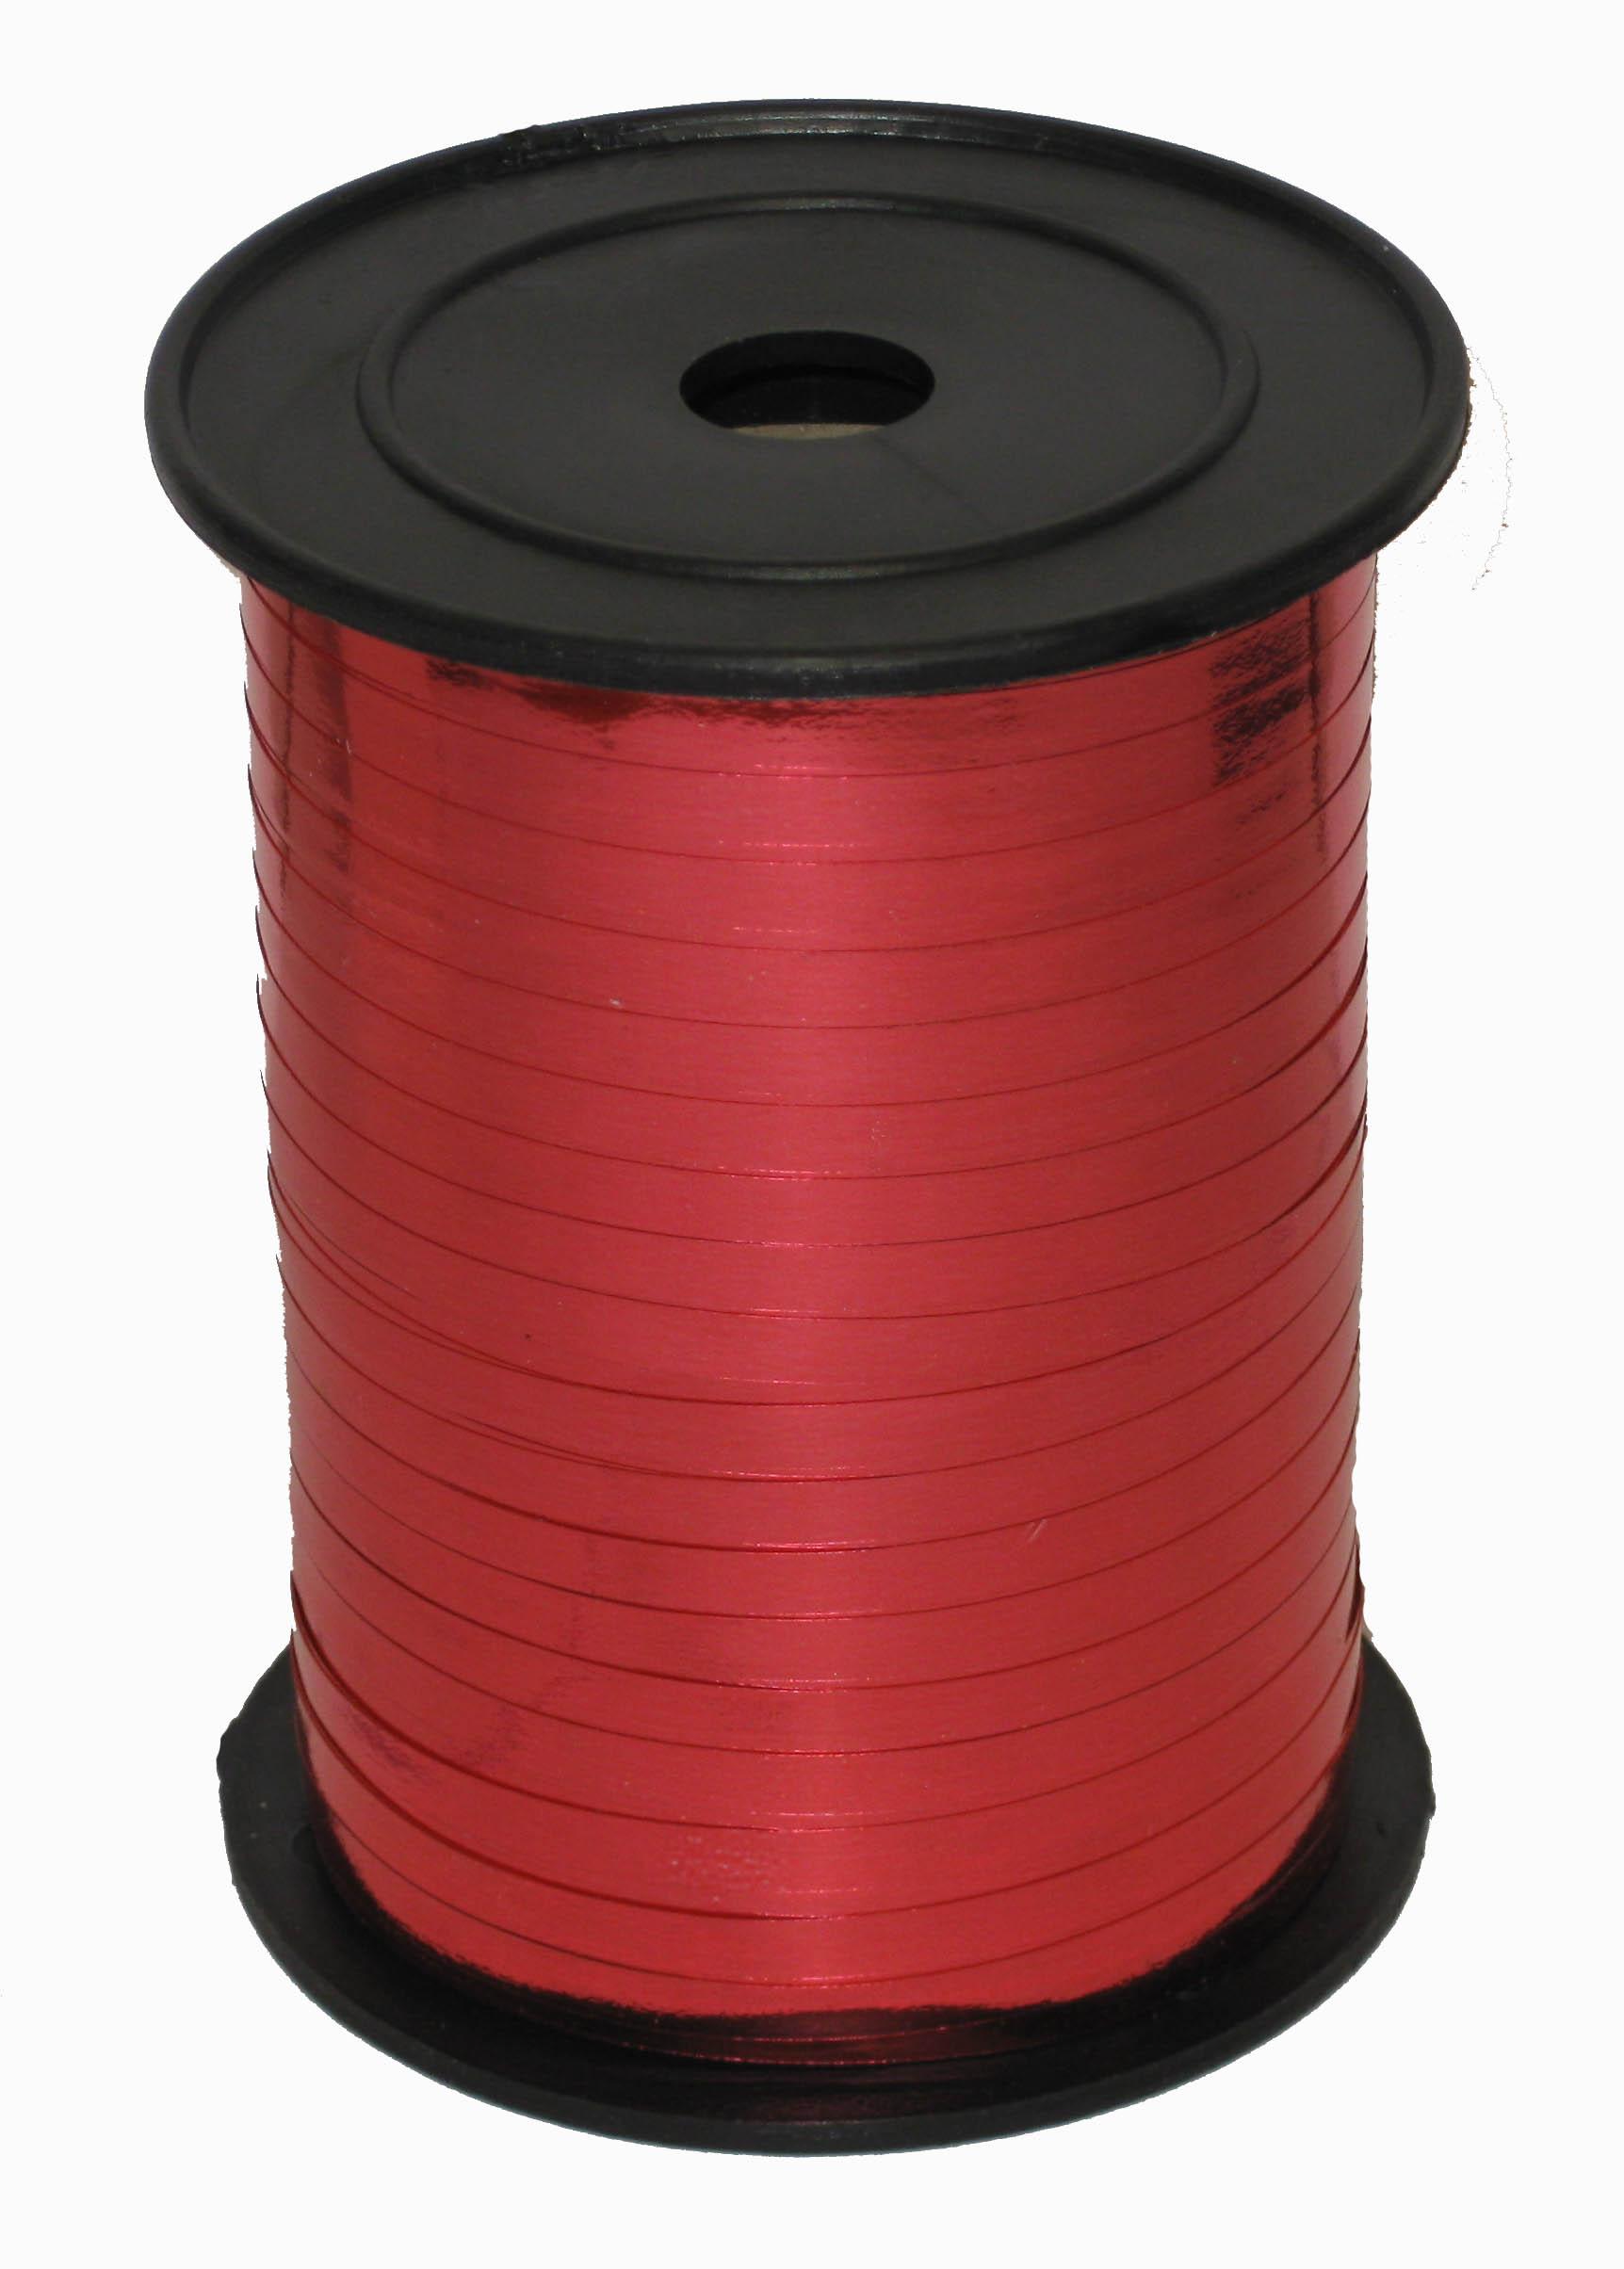 Лента Красная металл, бобина 0,5 см / 250 м / Россия